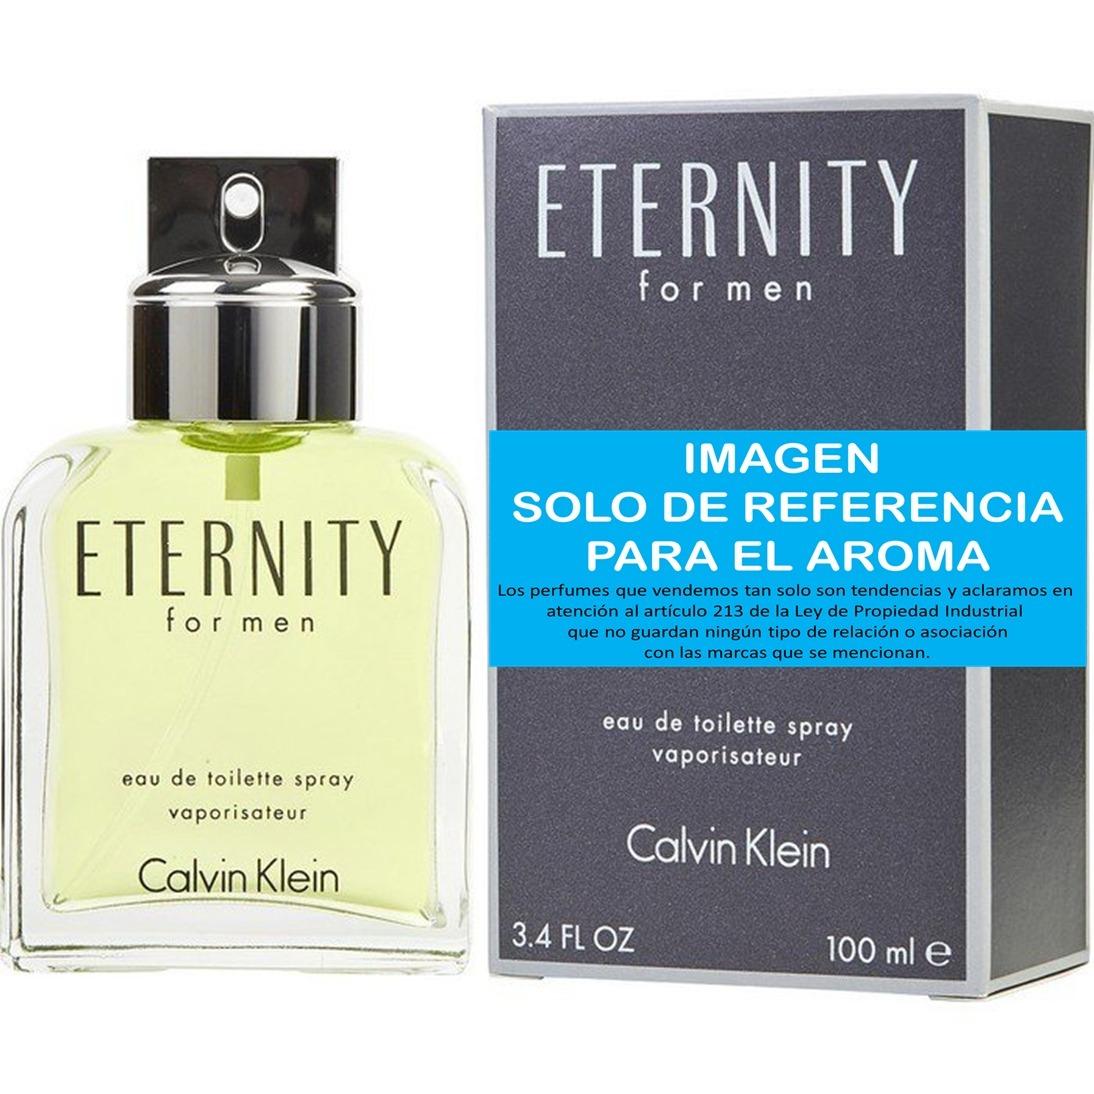 1c48ee93b9d38 perfume contratipo o tendencia a eternity zenz feromonas. Cargando zoom.